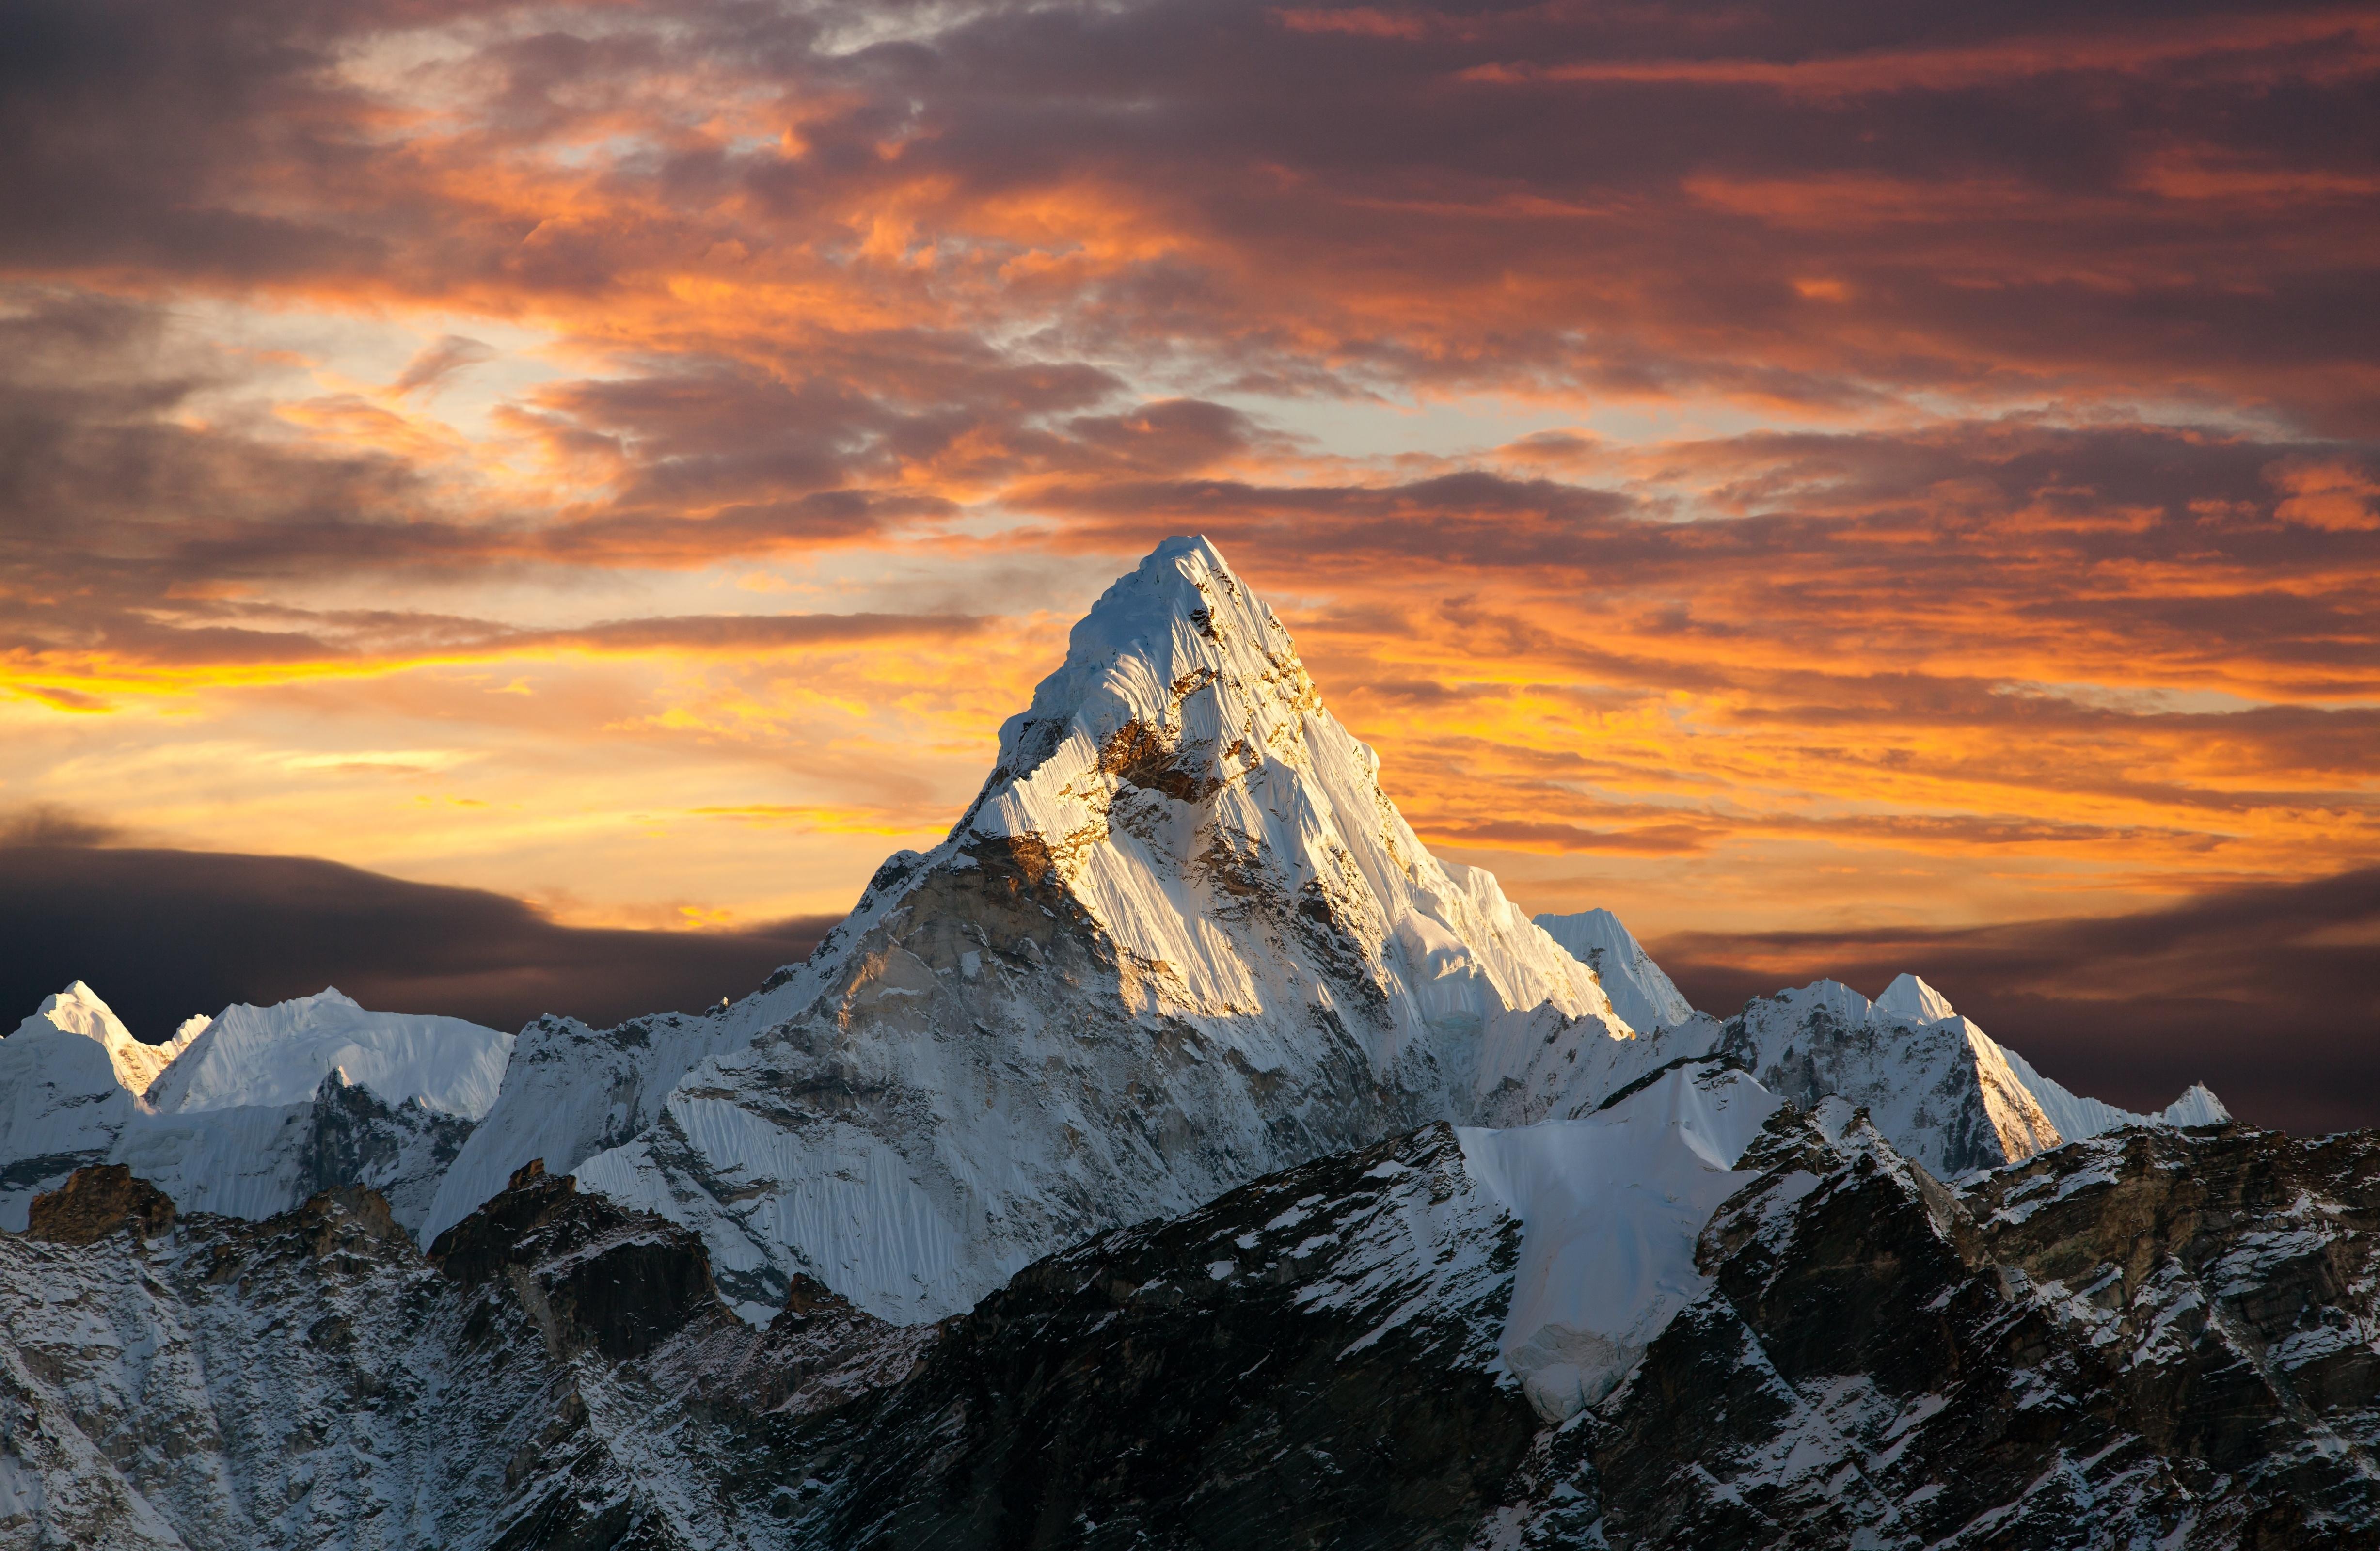 Tushita Himalaya 4k Ultra HD Wallpaper